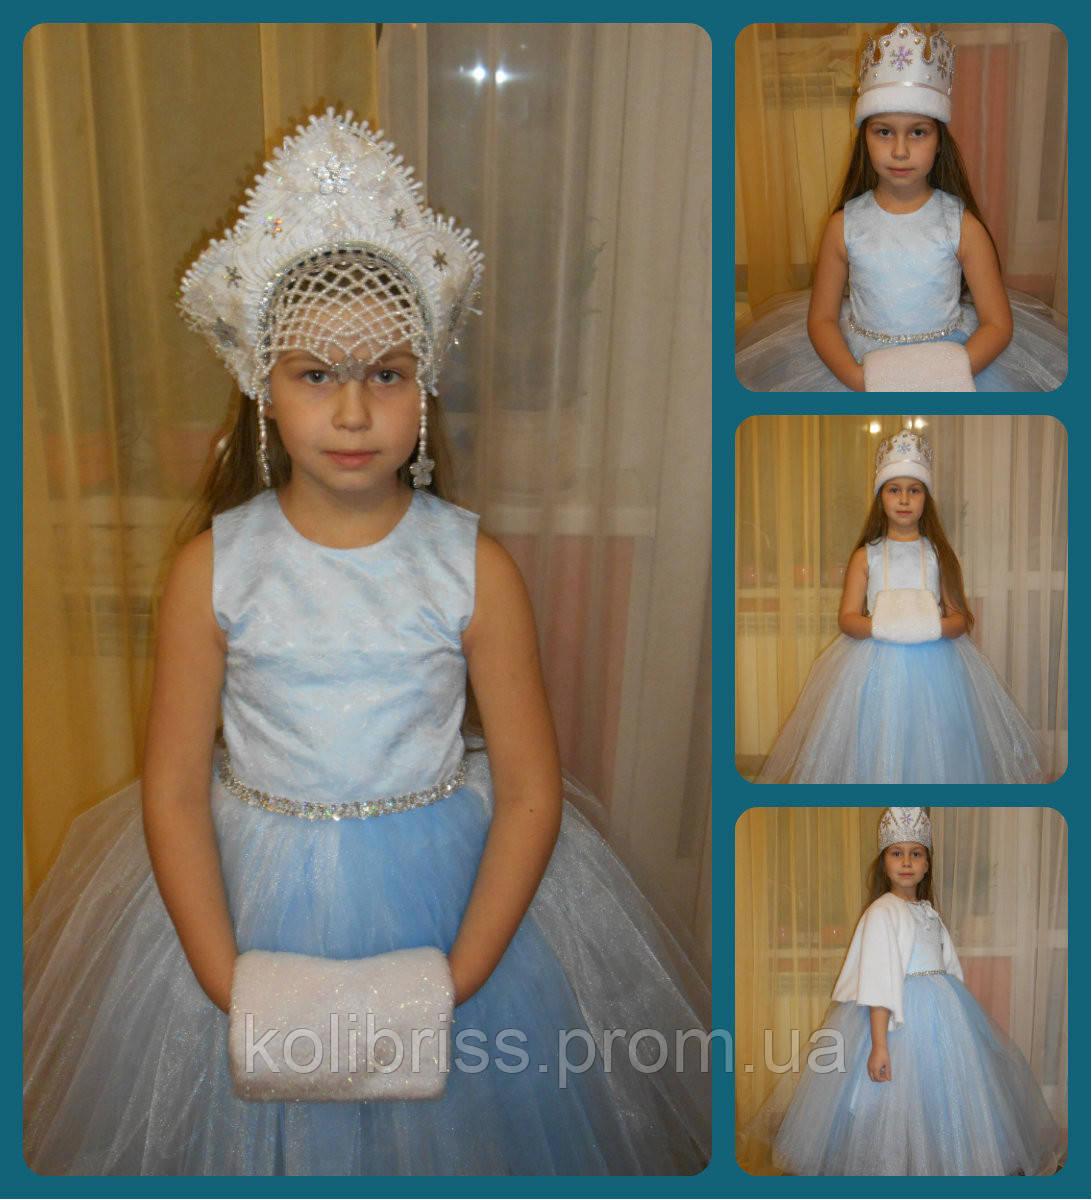 Шикарний костюм снігуроньки VIP. Дитячий костюм снігуронька прокат Київ